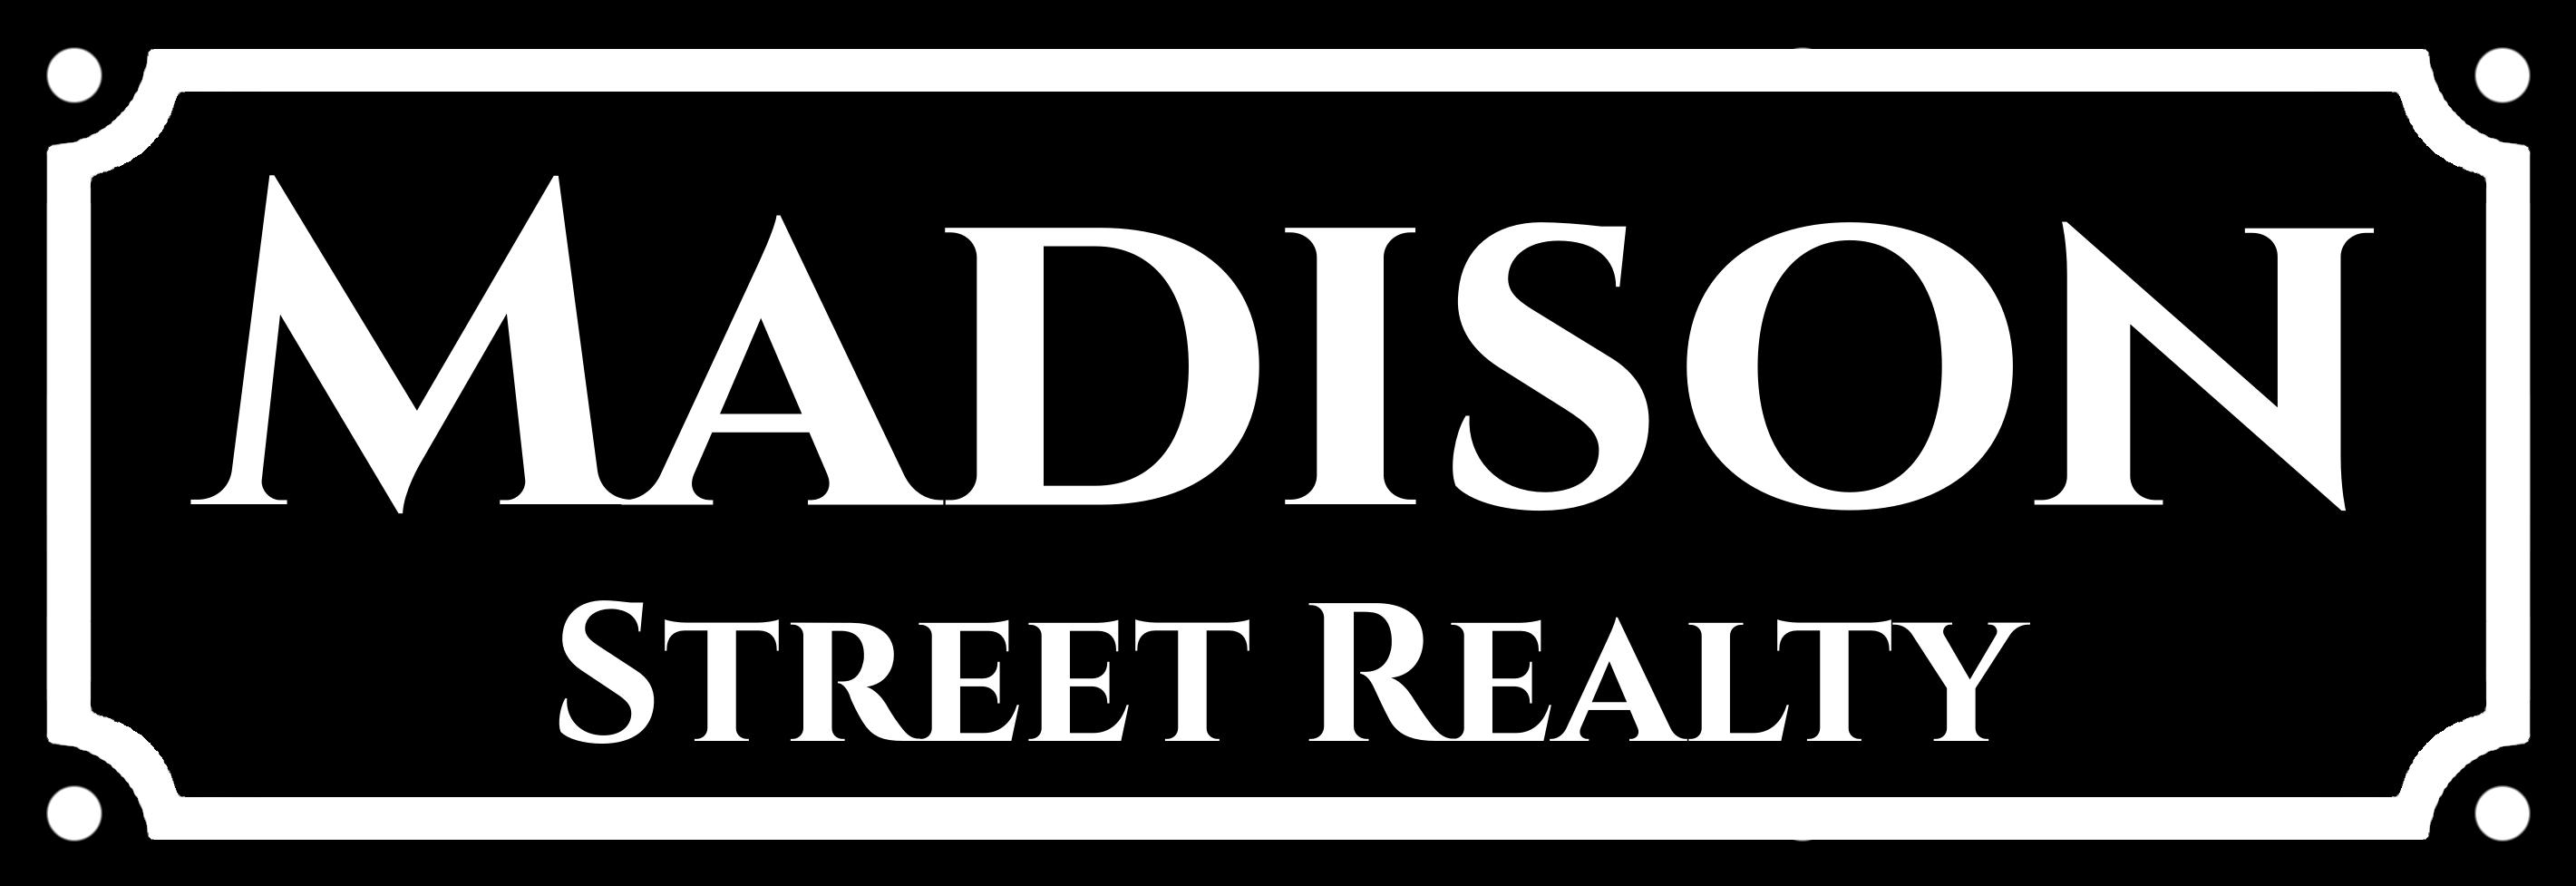 Madison Street Realty